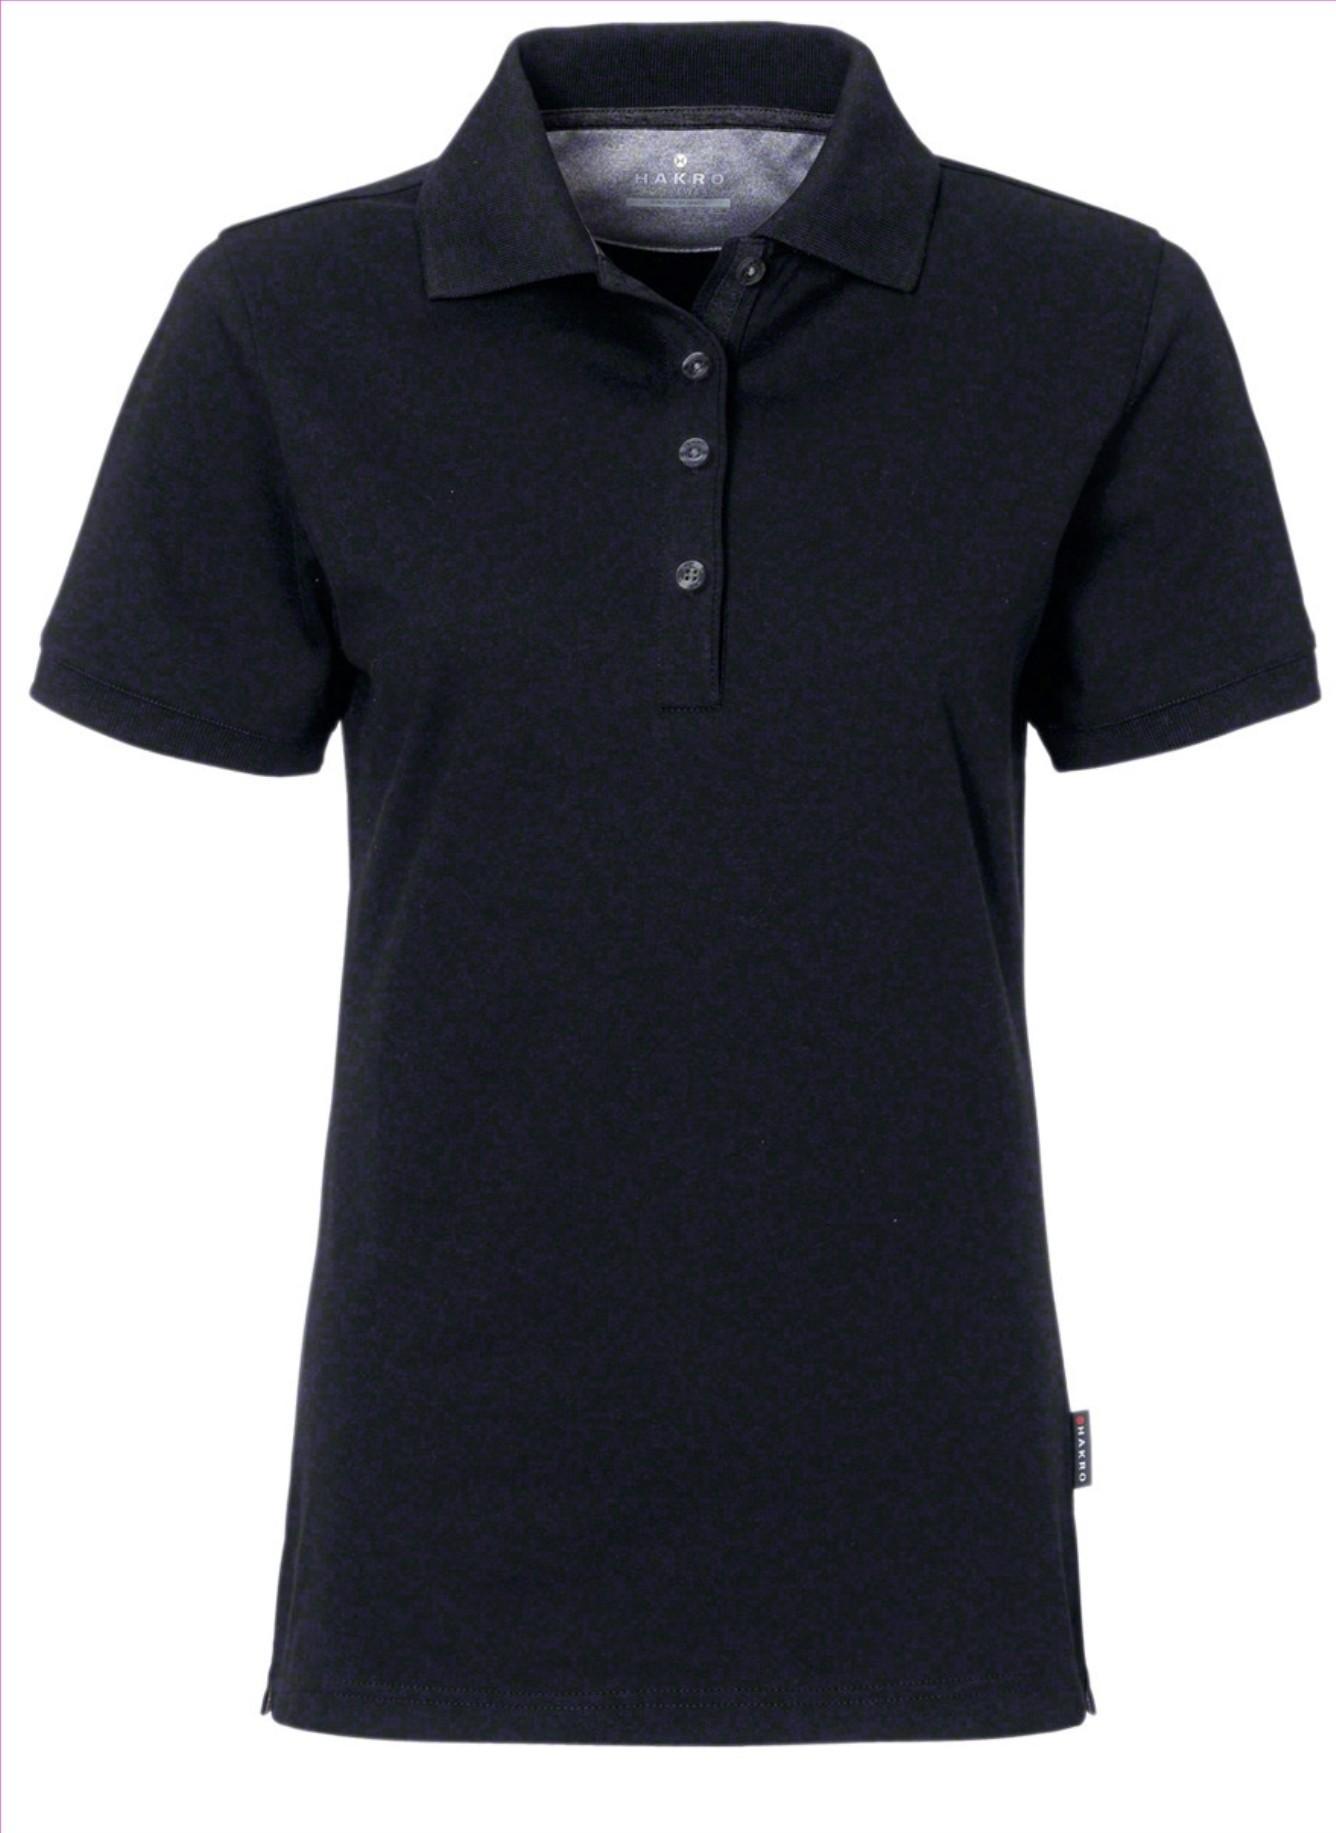 HAKRO Poloshirt Cotton-Tec Damen